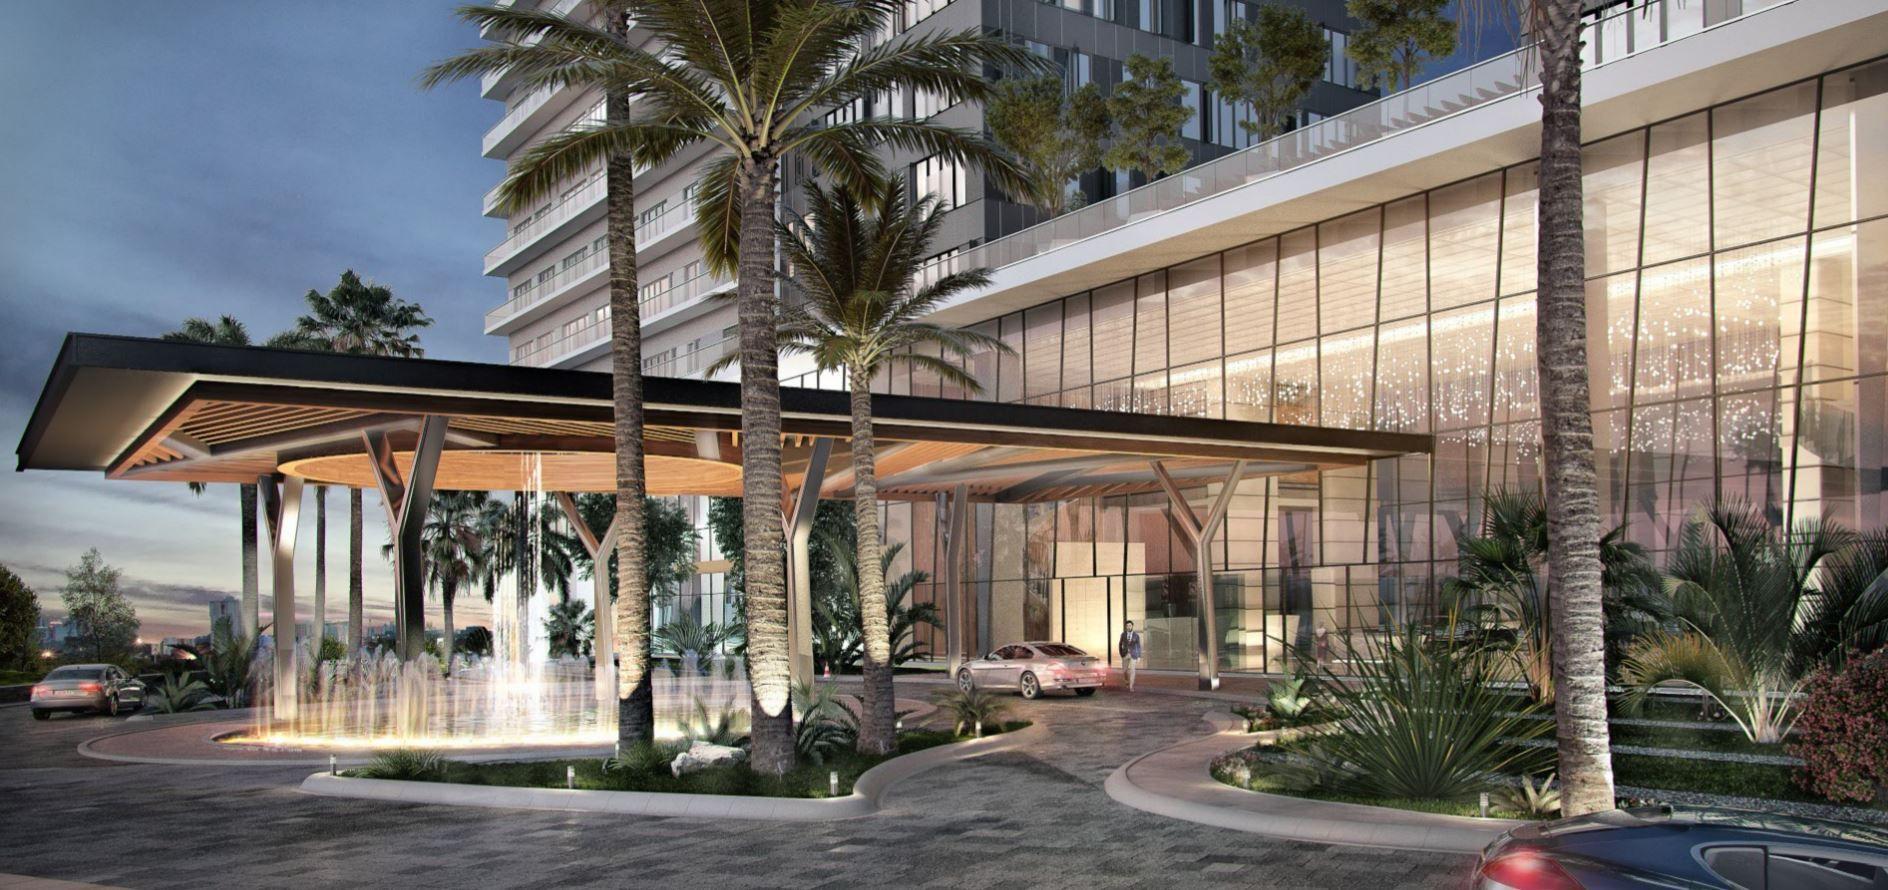 Motor lobby oak 58 arquitectura pinterest bamb for Arquitectura de hoteles